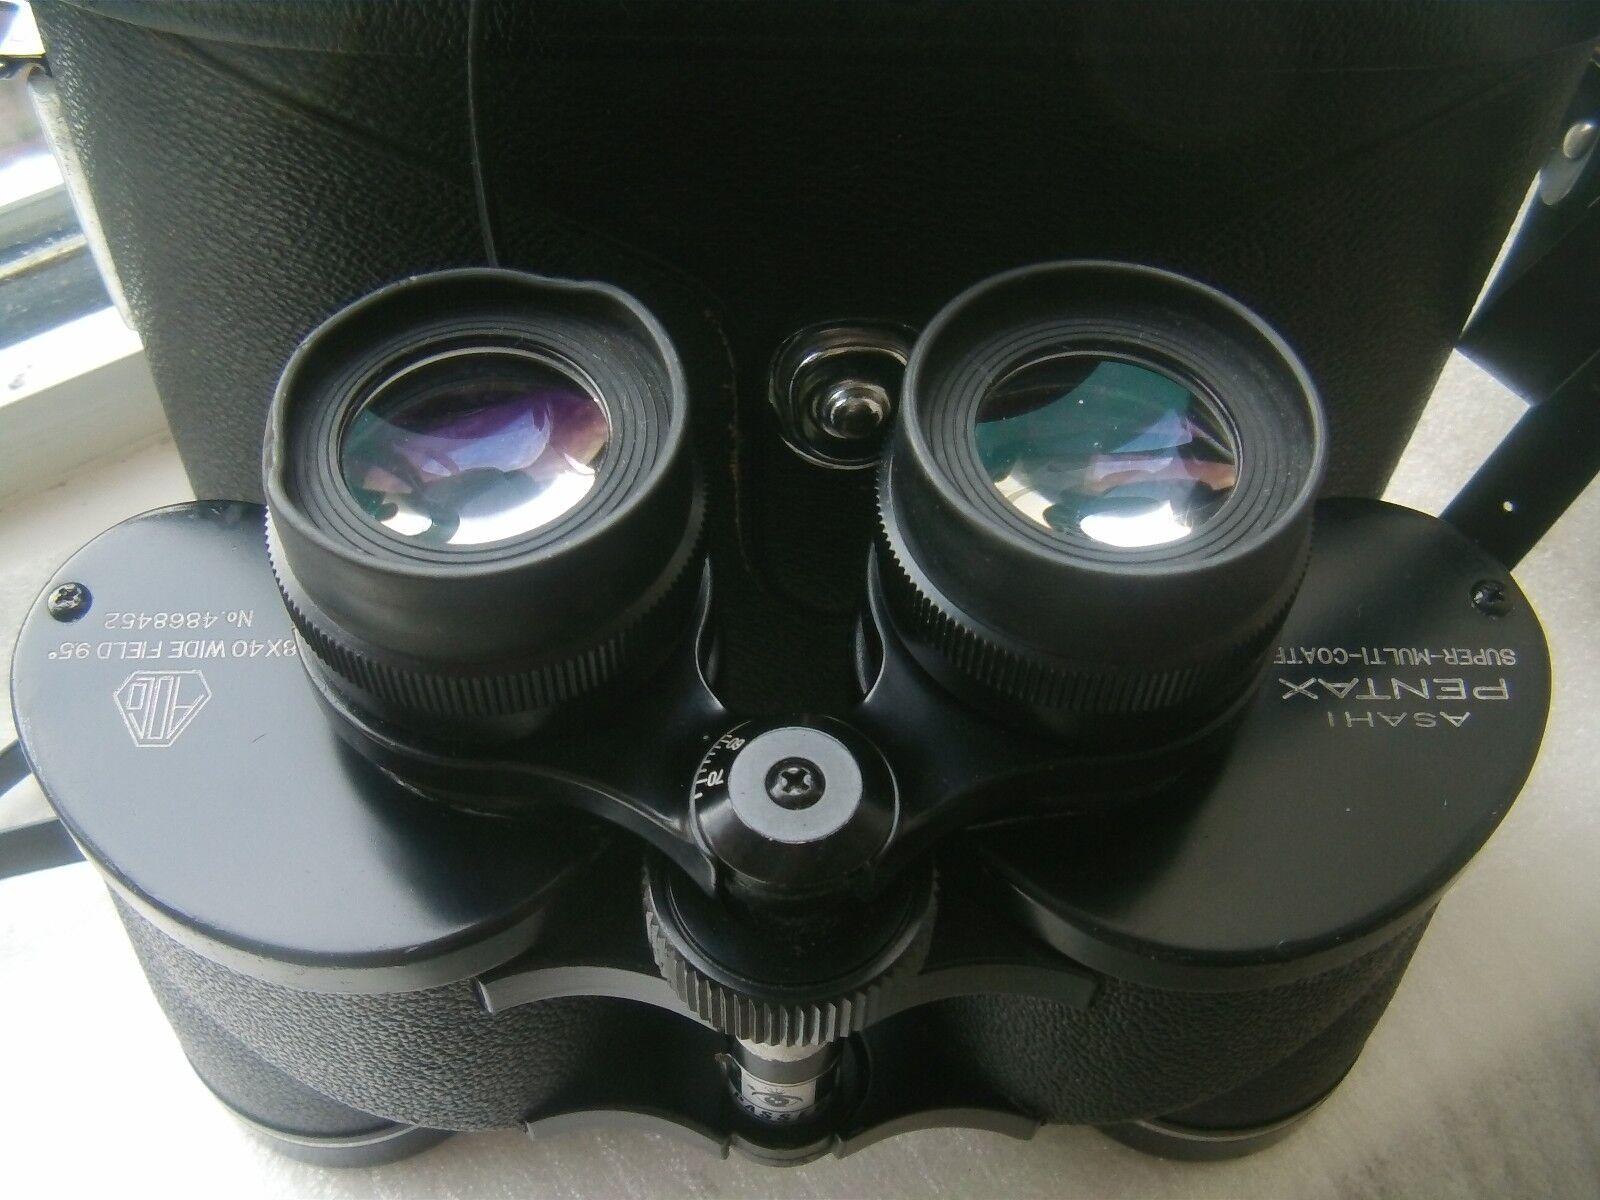 Pentax wide angle 9.5 degrees 8X40 BINOCULARS rubber eyecups case straps caps